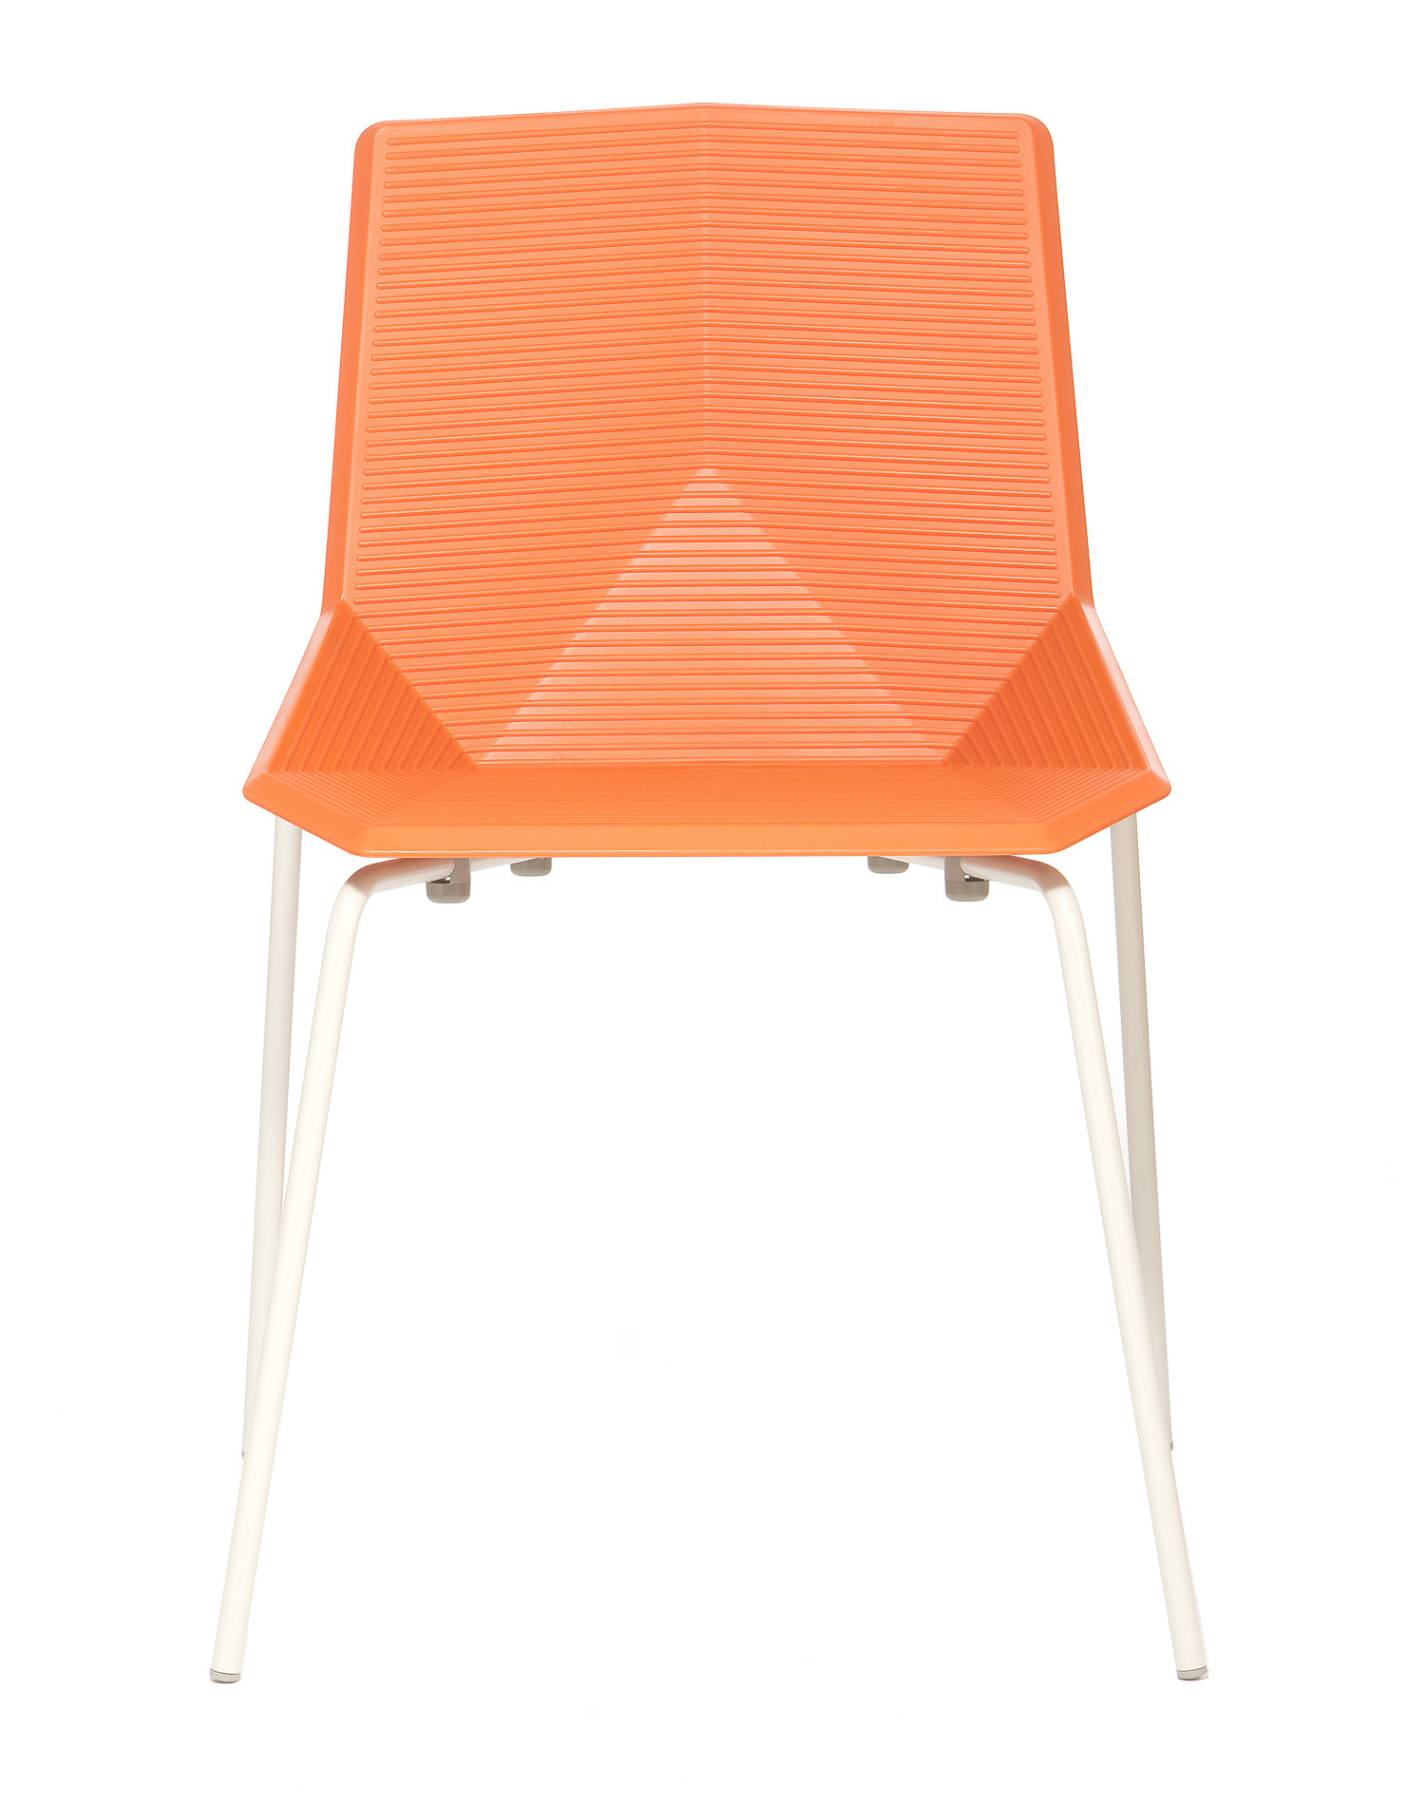 Mobles114 Green Colors Stuhl Orange